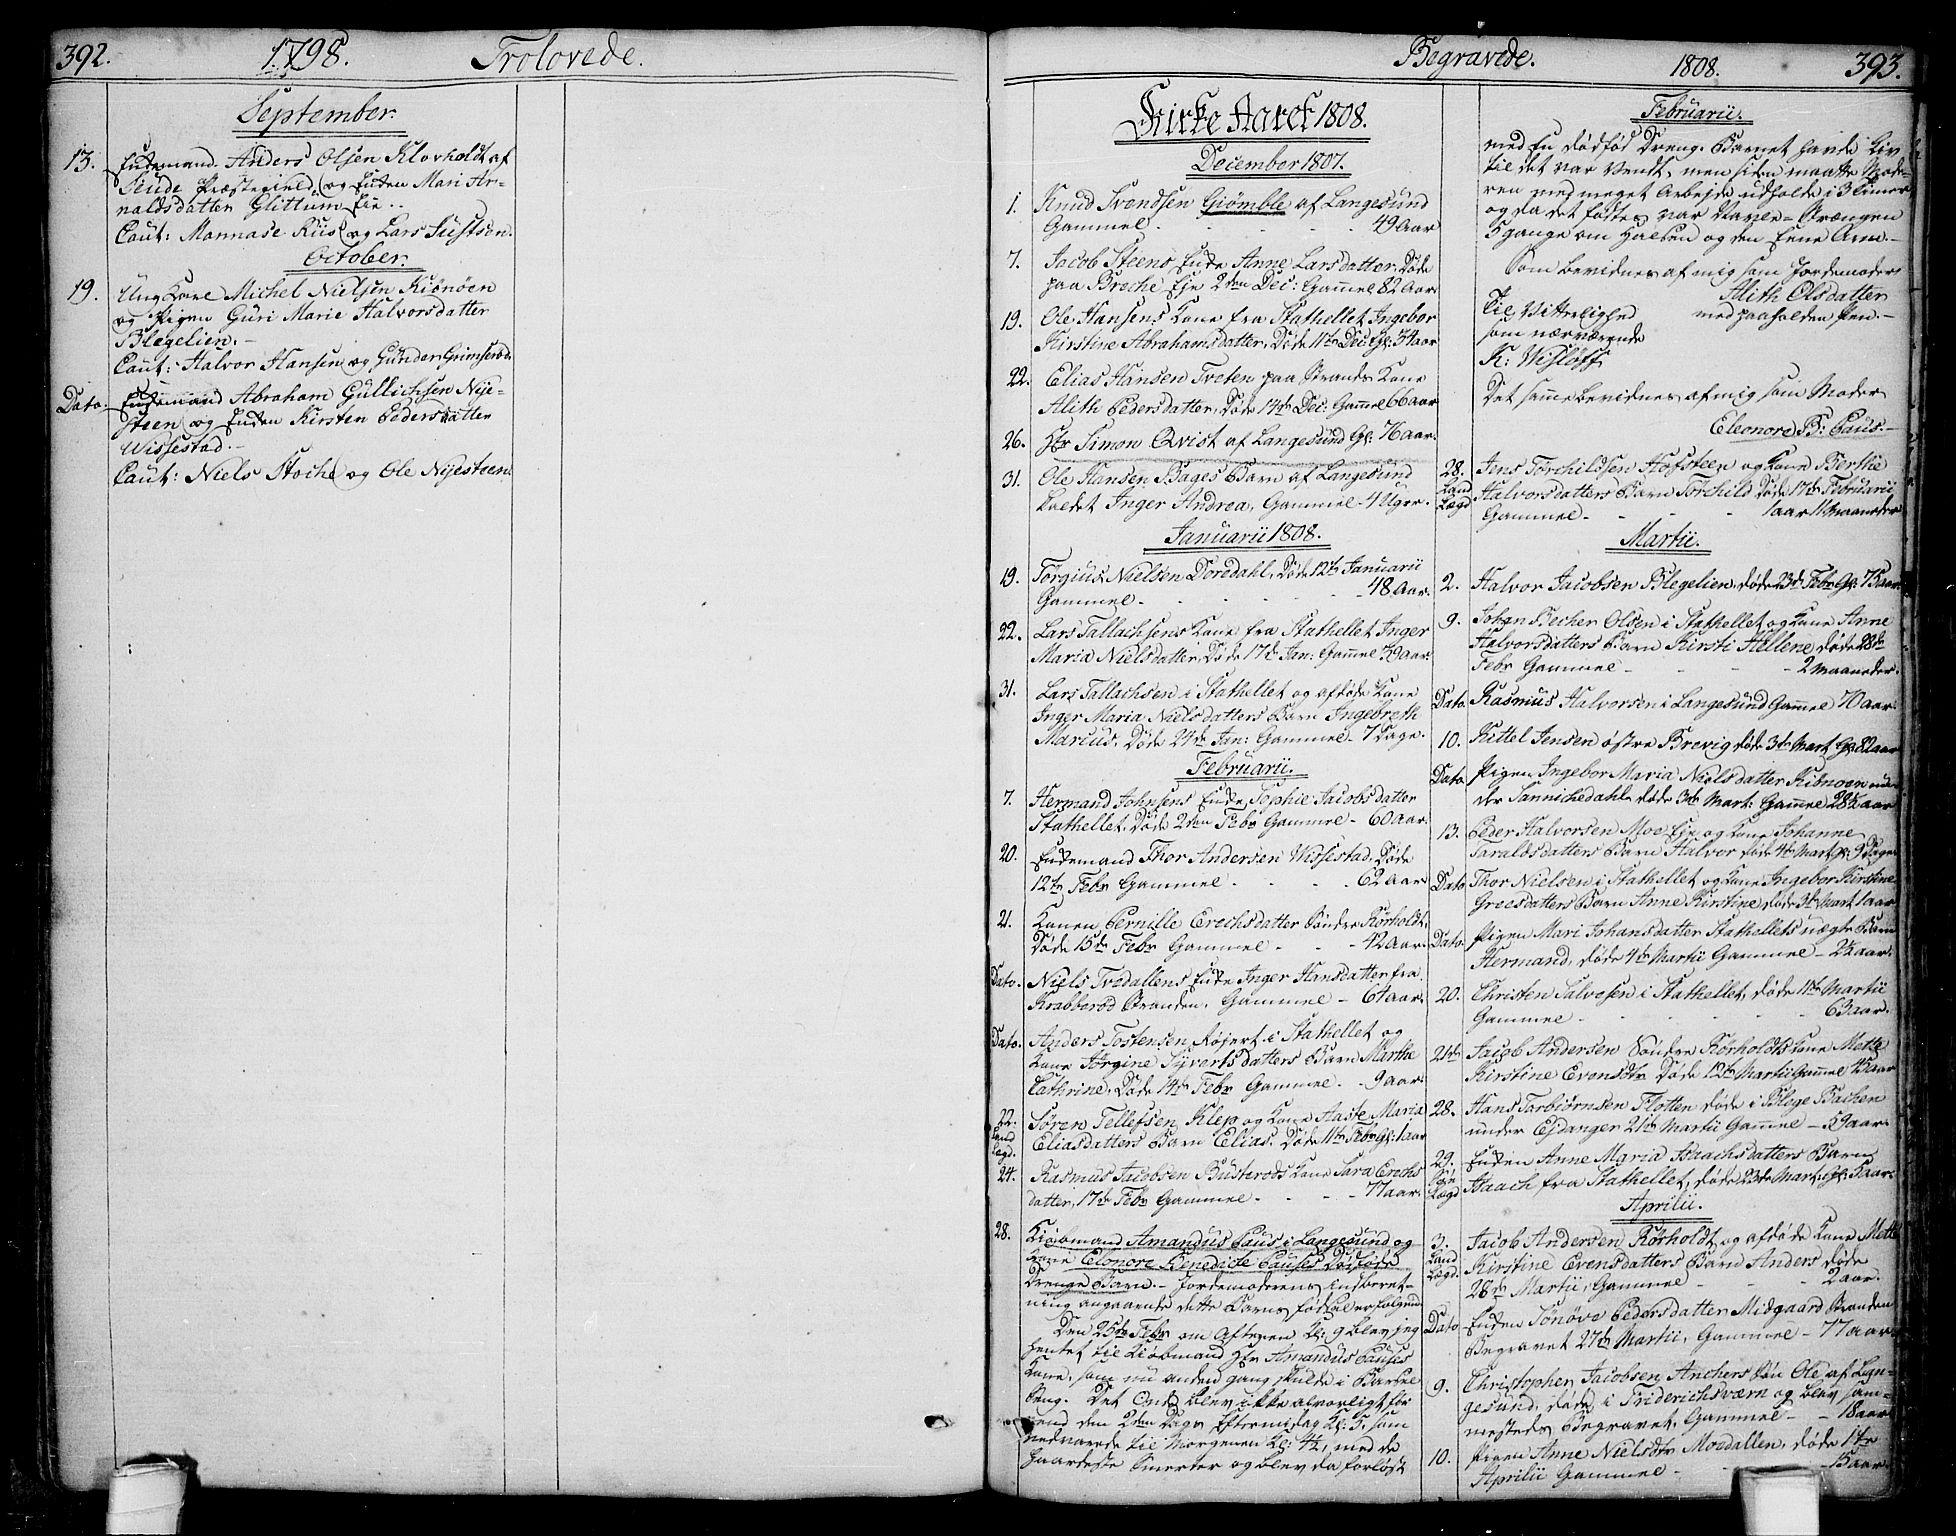 SAKO, Bamble kirkebøker, F/Fa/L0002: Ministerialbok nr. I 2, 1775-1814, s. 392-393